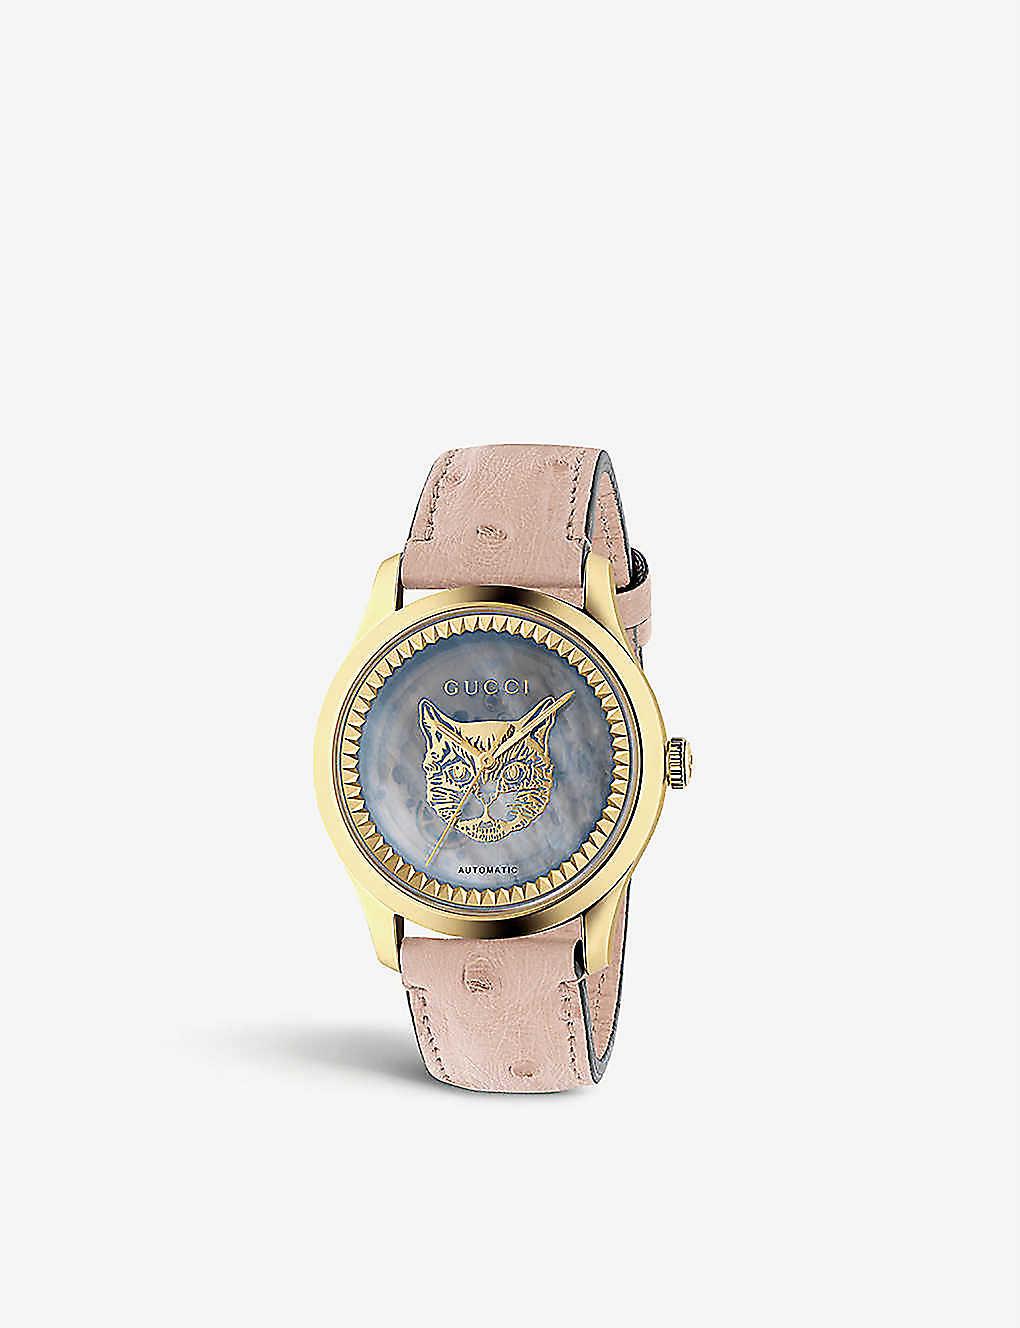 8c130f9d8c0 GUCCI - YA1264110 G-Timeless yellow-gold